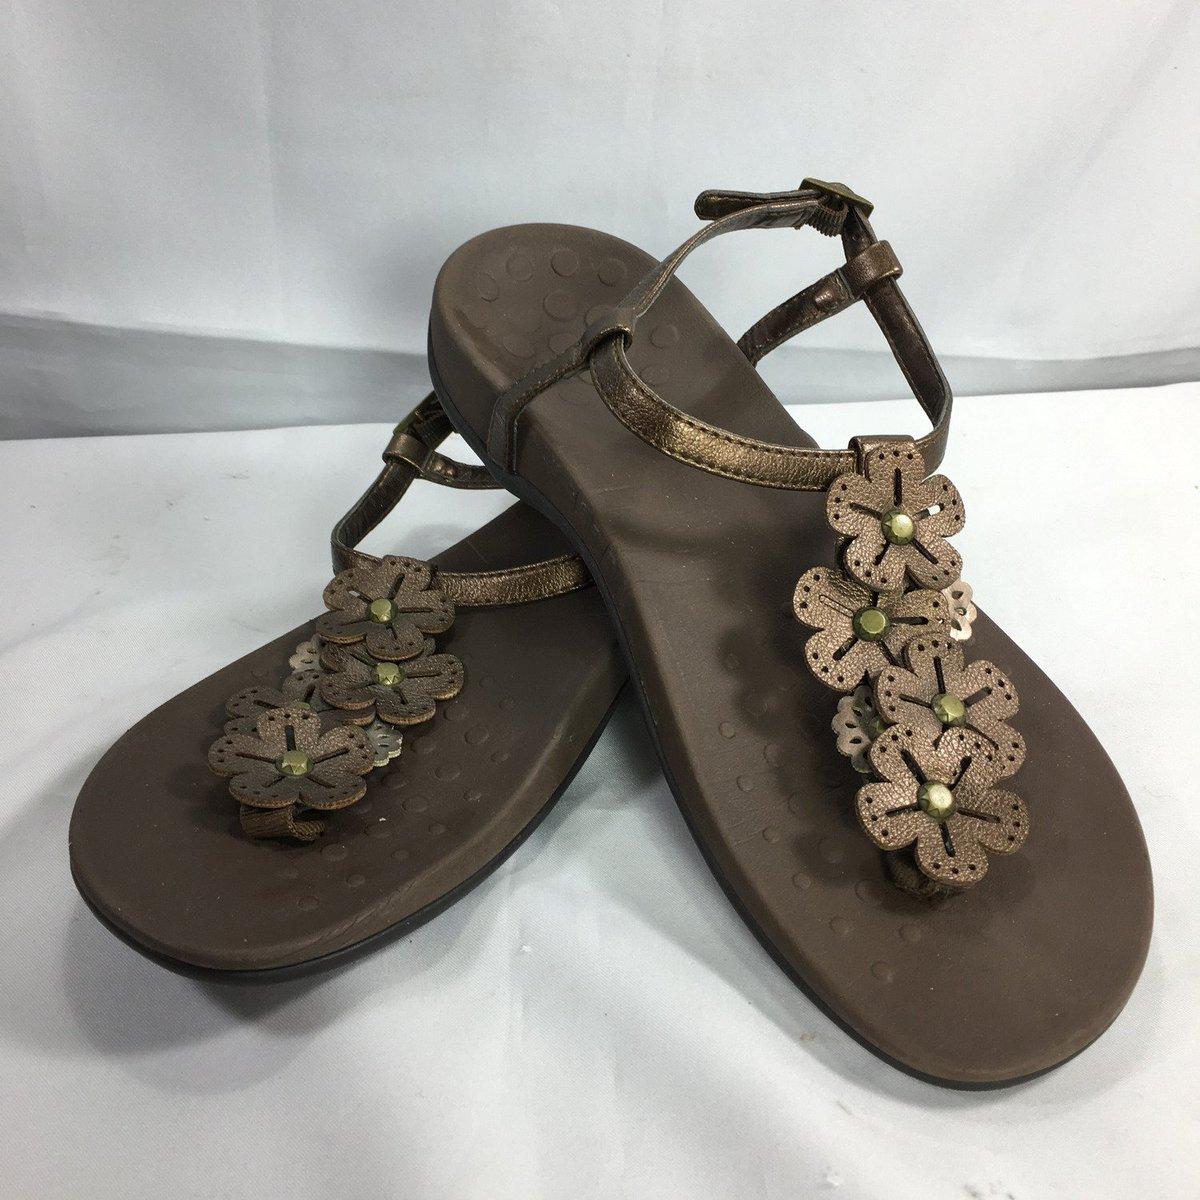 a400e3fcc18 Vionic Adjustable T-strap Sandal https   ebay.to 2PrCD41  vionic  sandals   shoes  fahionista  fashion  style  ootd  vionicshoes  fashionfootcare ...